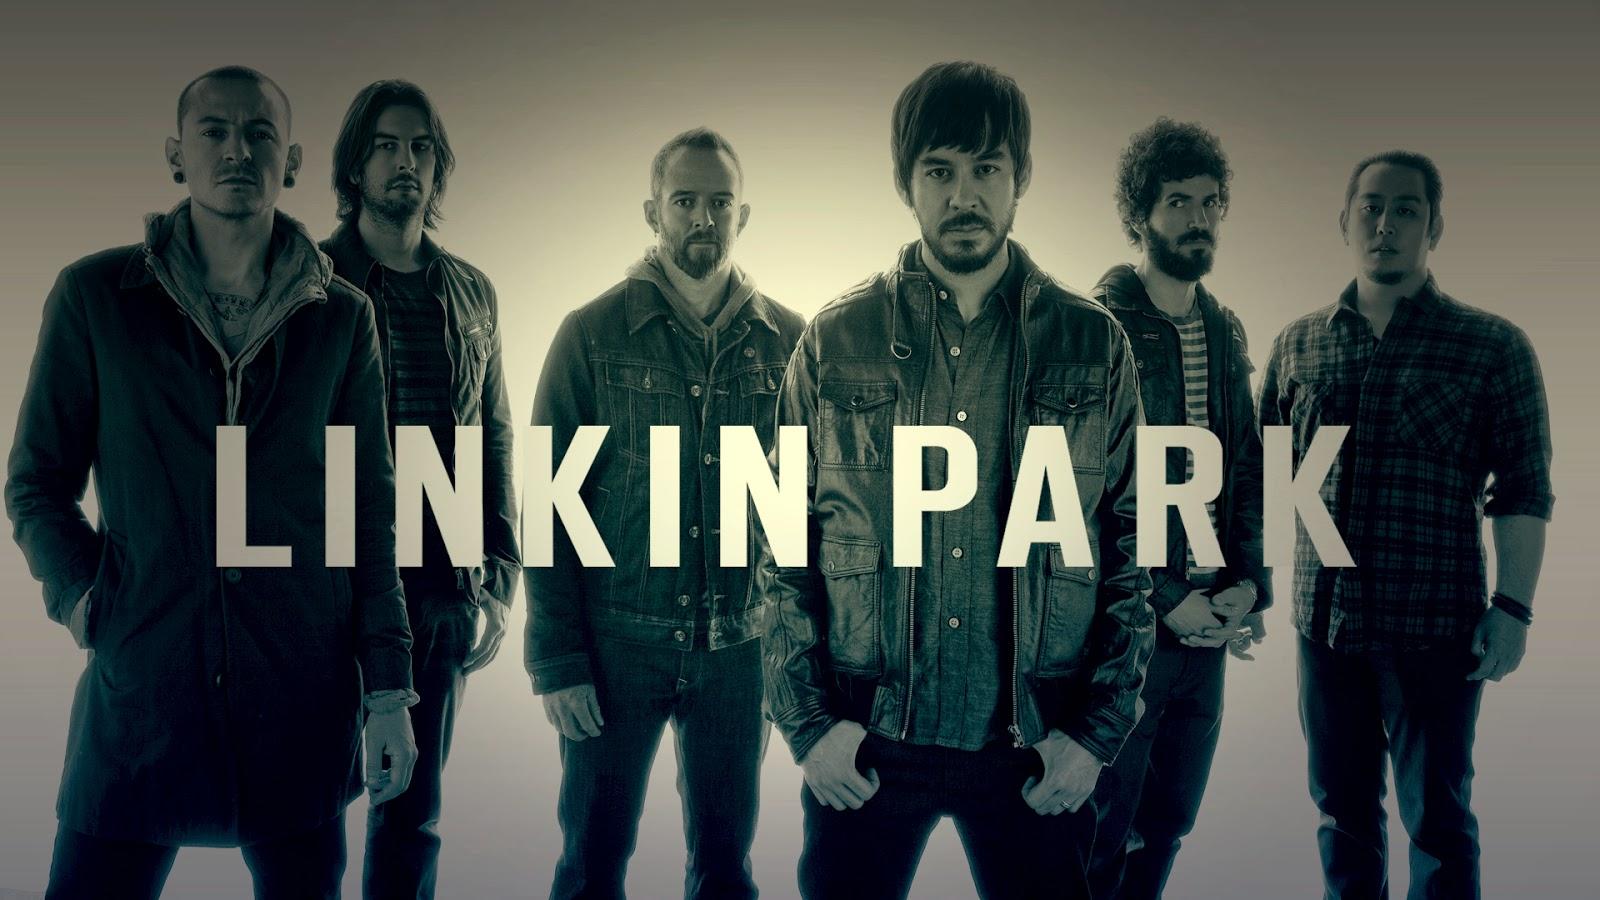 linkin park 2014 альбом слушать